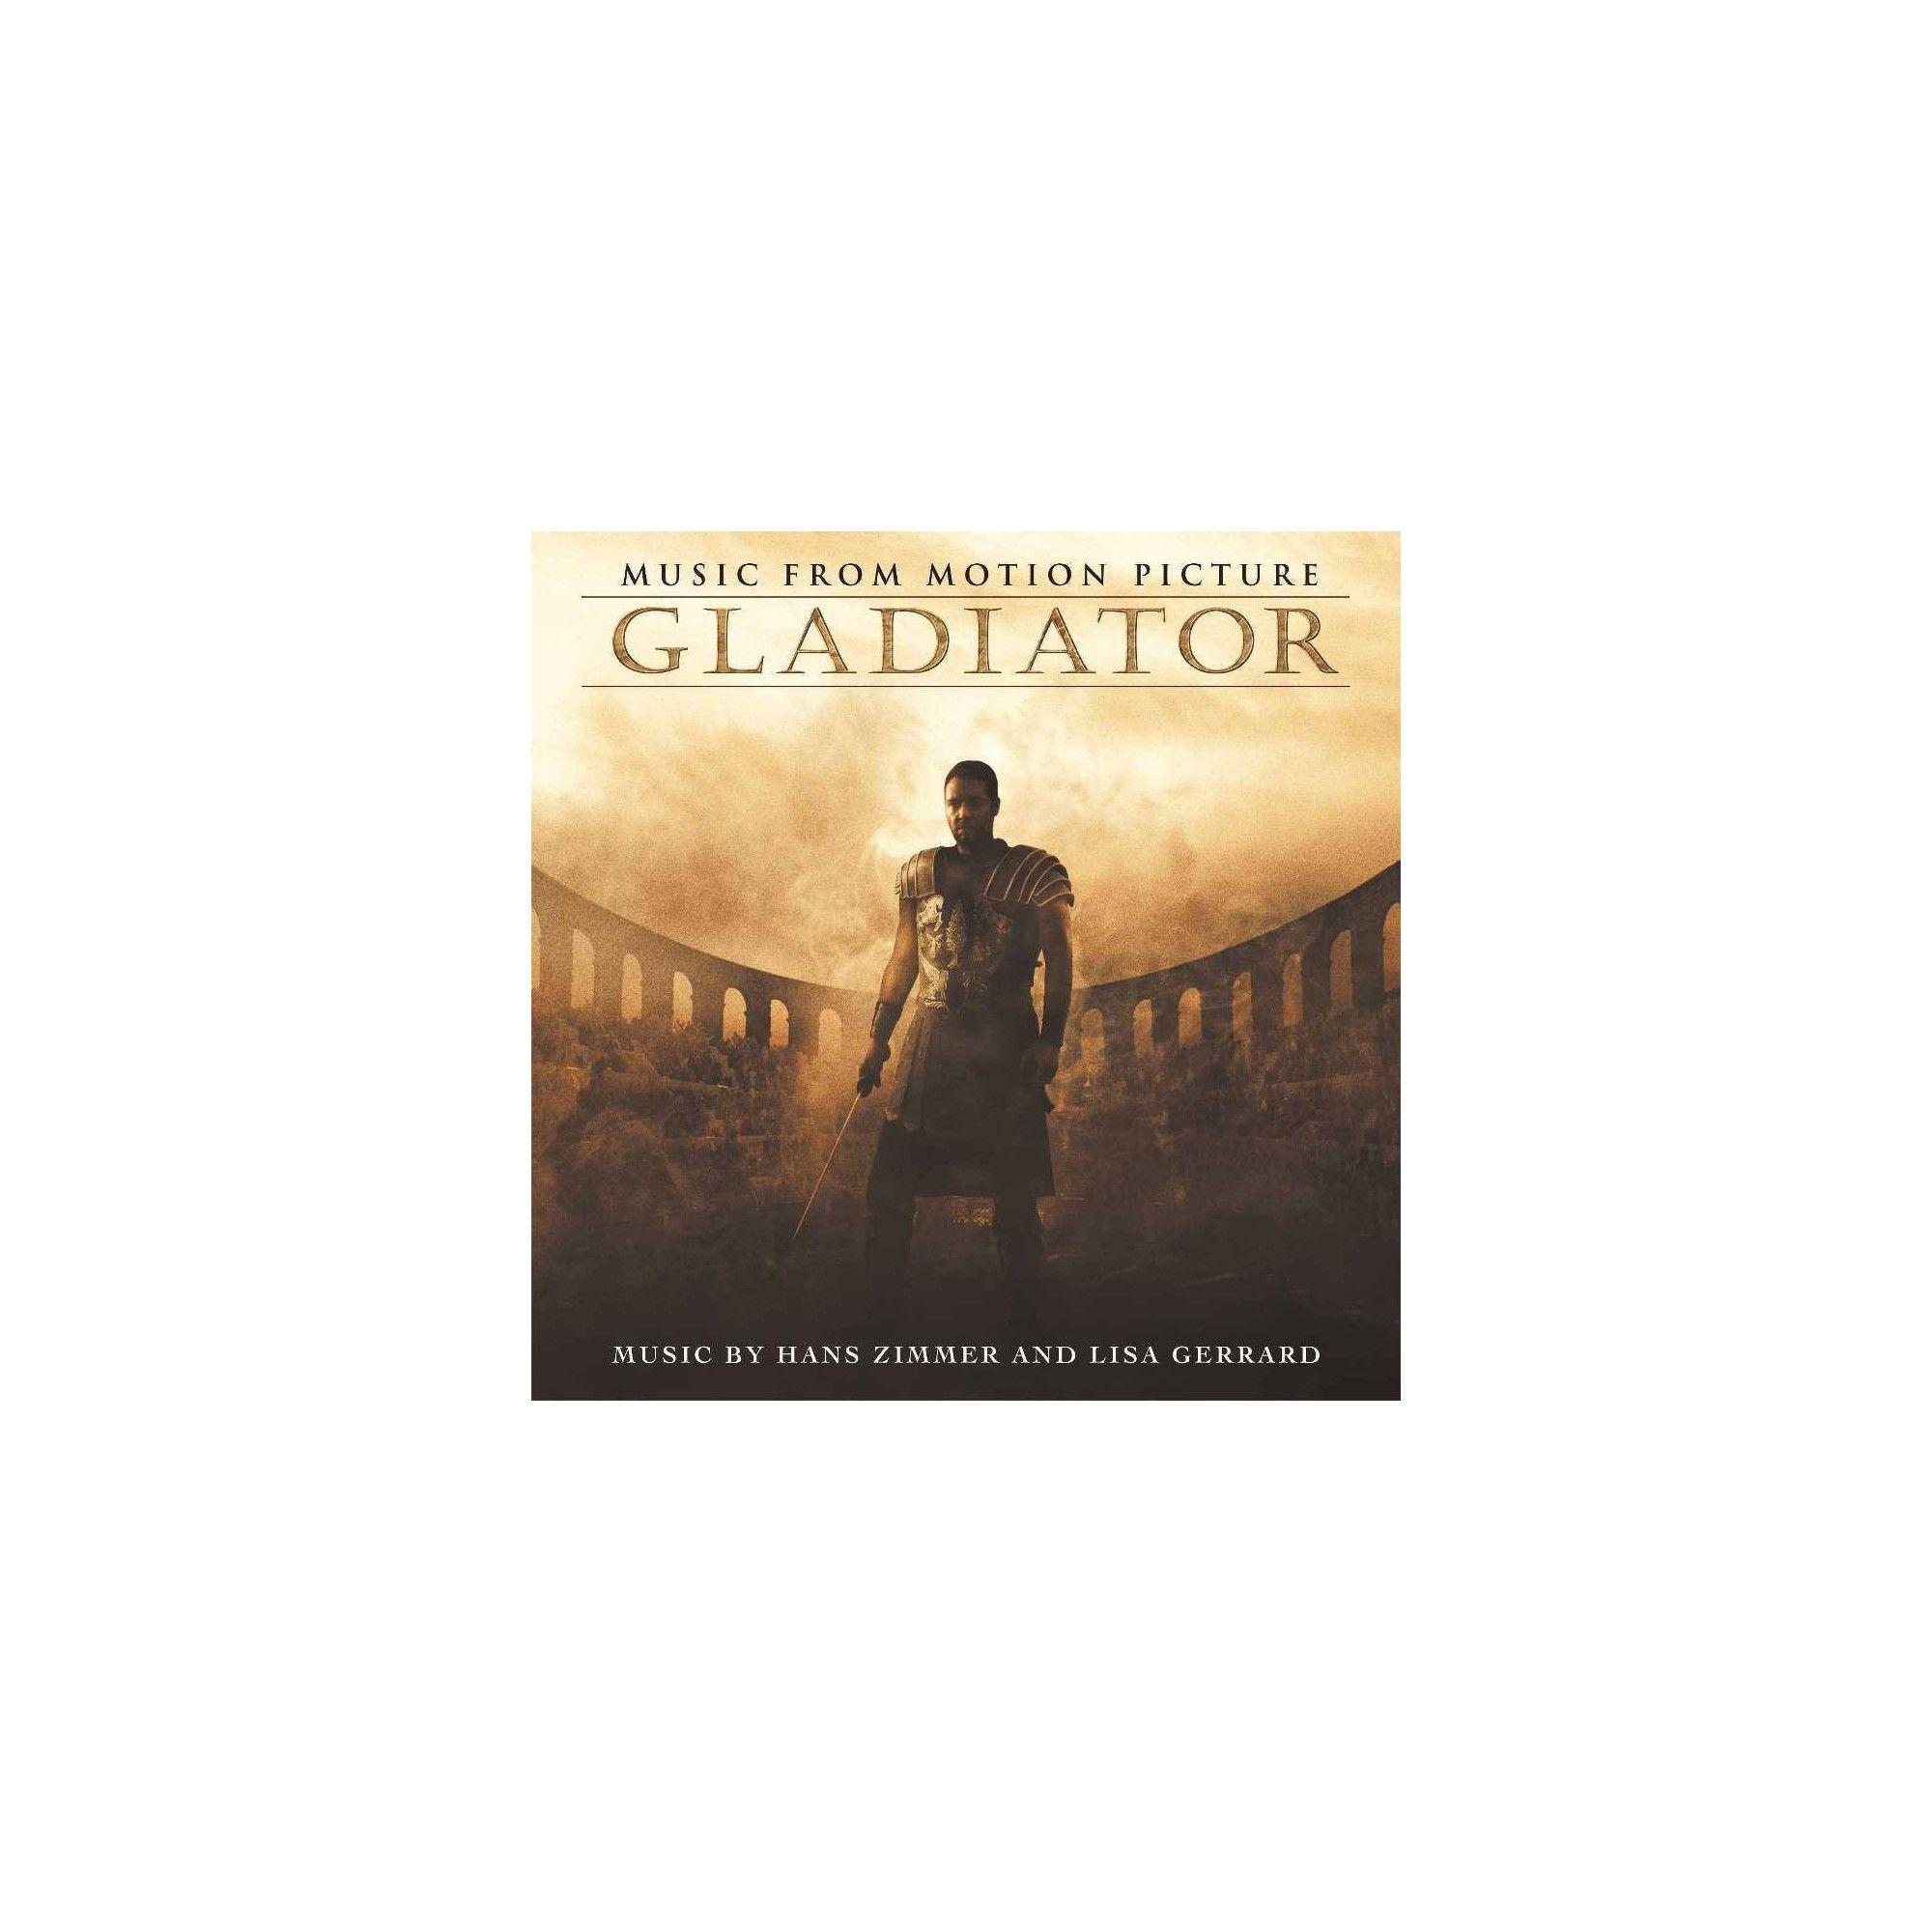 Various Gladiator Ost Vinyl Vinyl Ost Gladiator